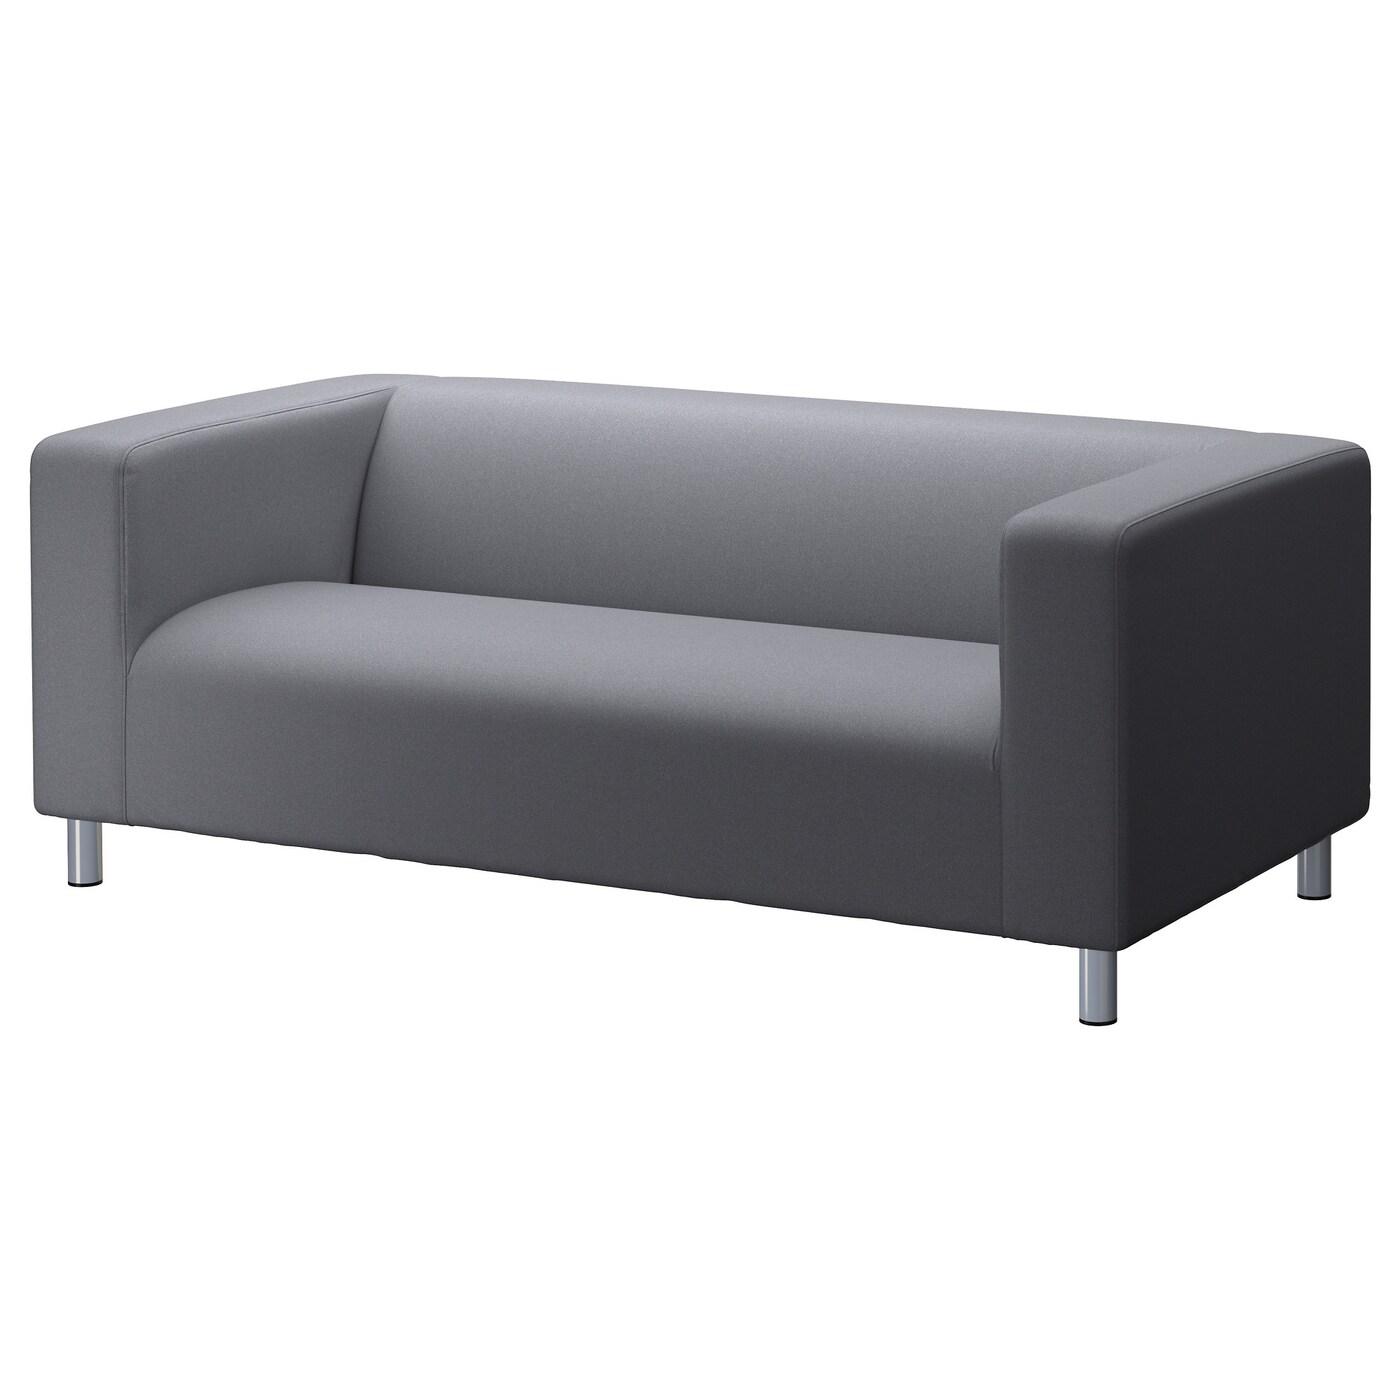 Klippan Flackarp Medium Grey Cover For 2 Seat Sofa Ikea